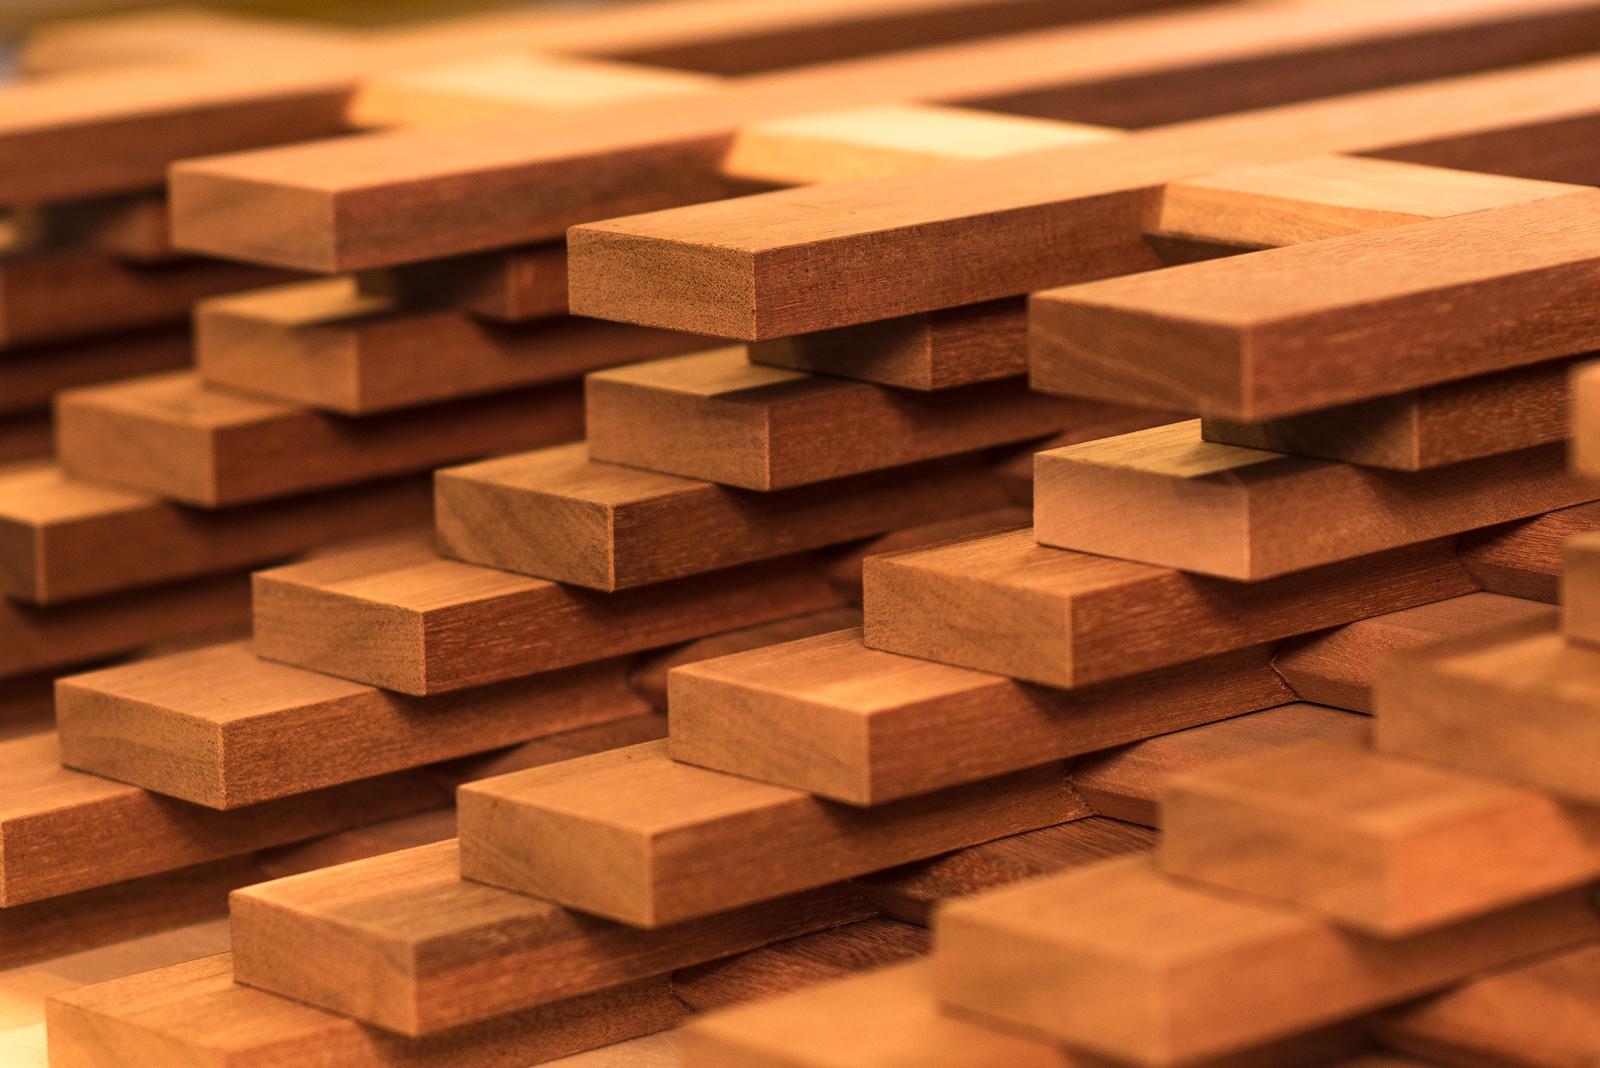 Werkplek houtbewerker Tweakhout door Josita Swarte Photography-19